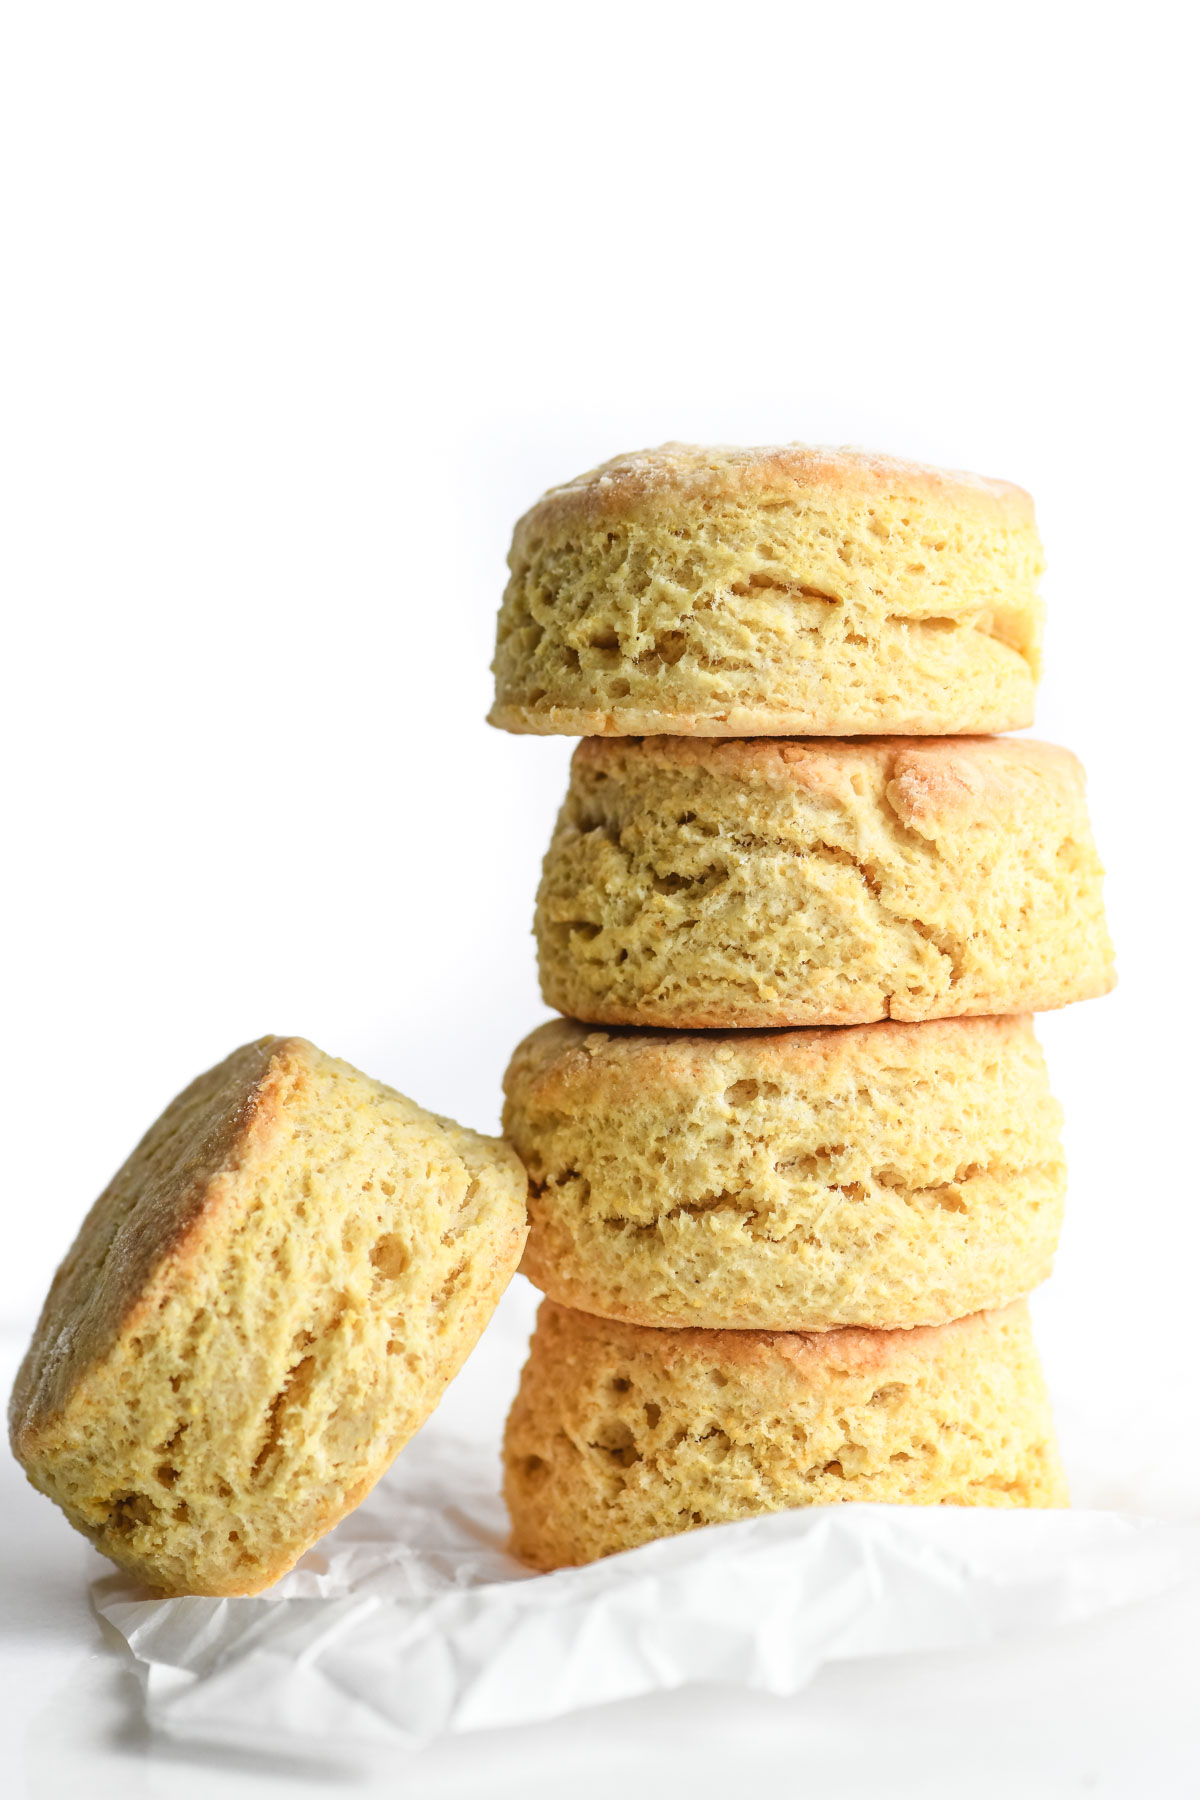 masa harina biscuits, stacked